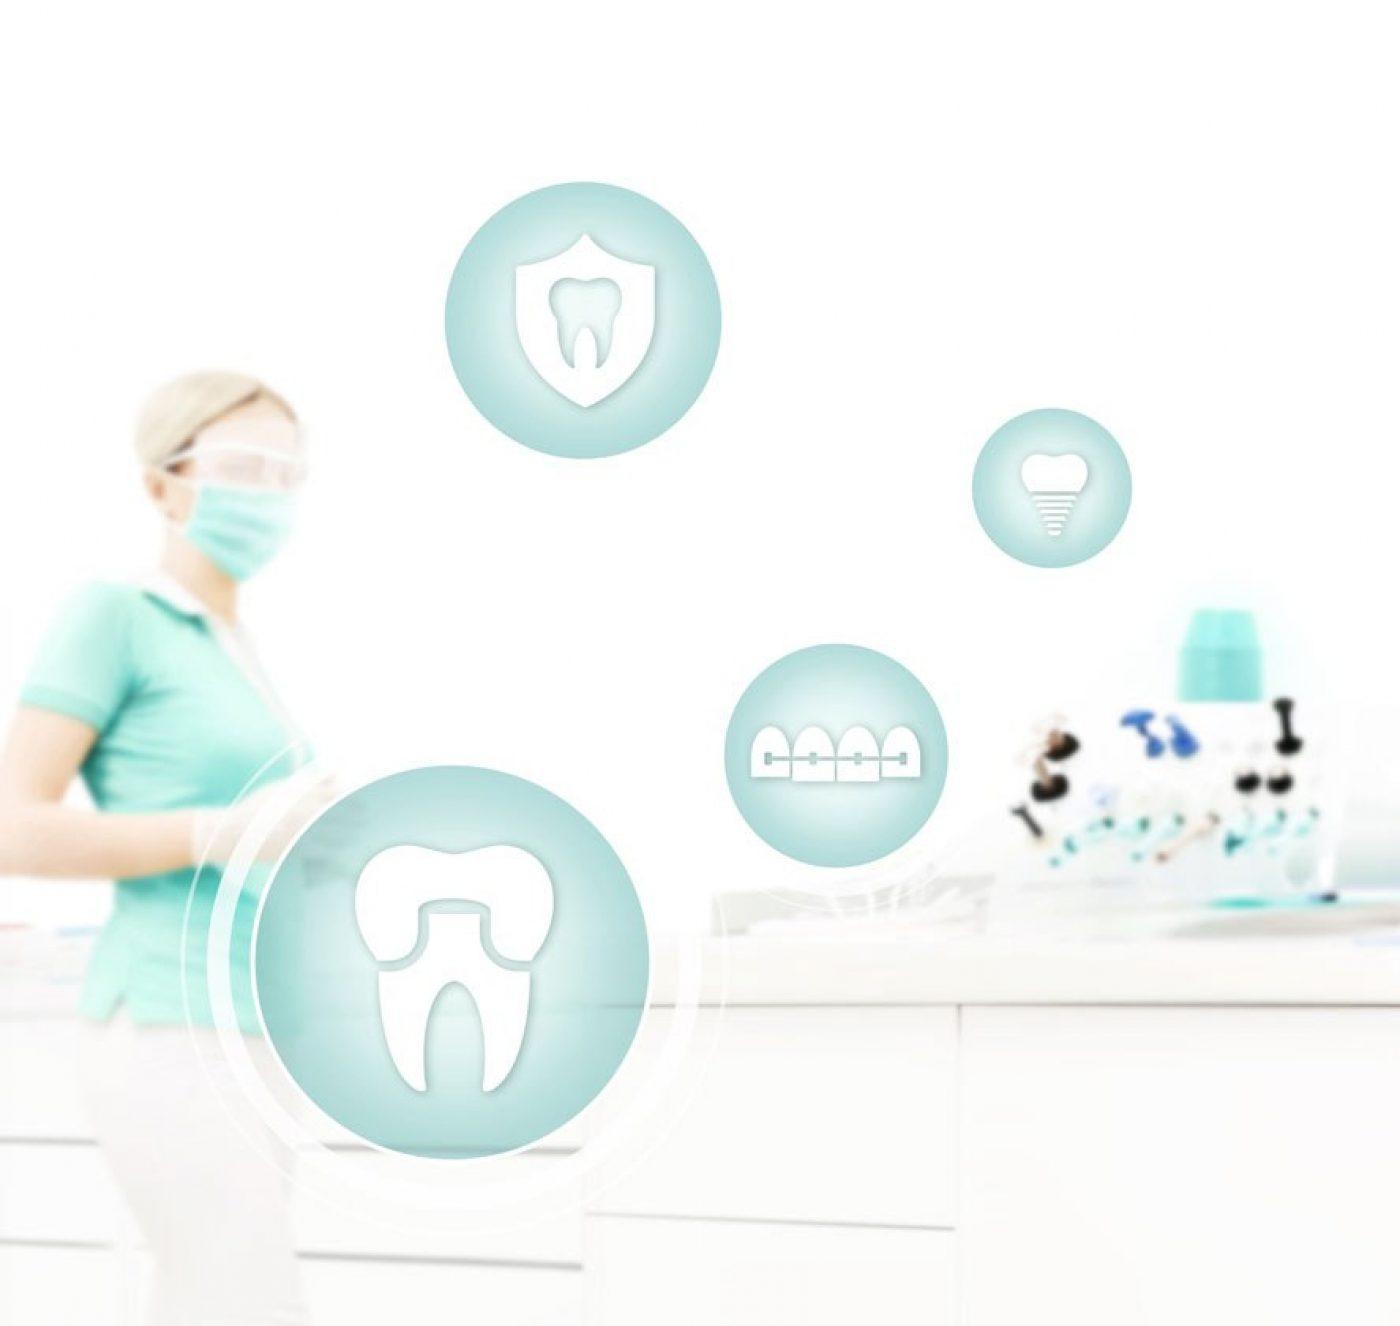 Advice Care Commondentalconditions Pembrokeshire Dental Care Newport